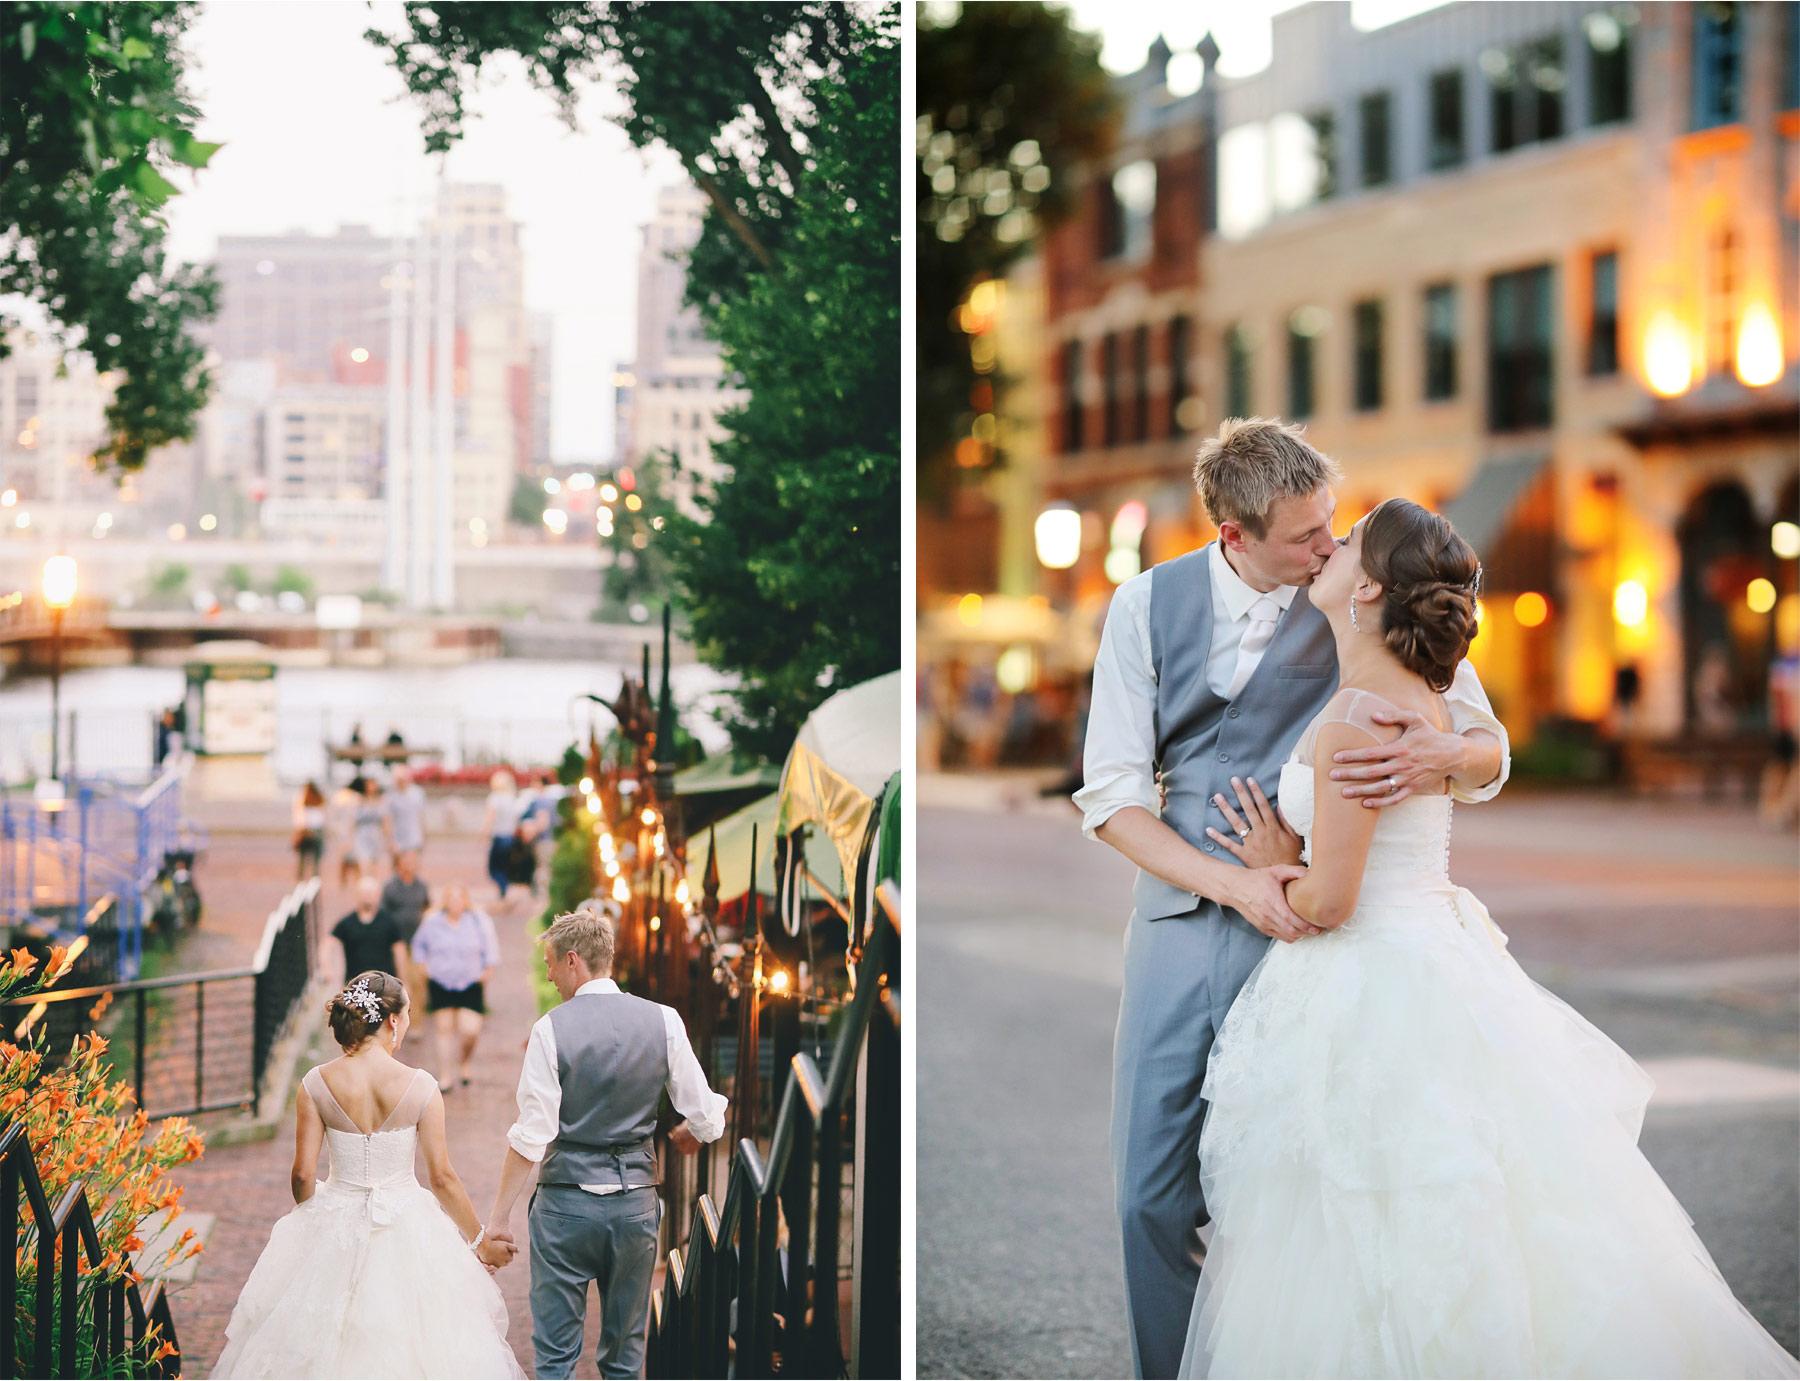 24-Minneapolis-Minnesota-Wedding-Photography-by-Vick-Photography-Saint-Anthony-Main-Brigid-and-Ernie.jpg